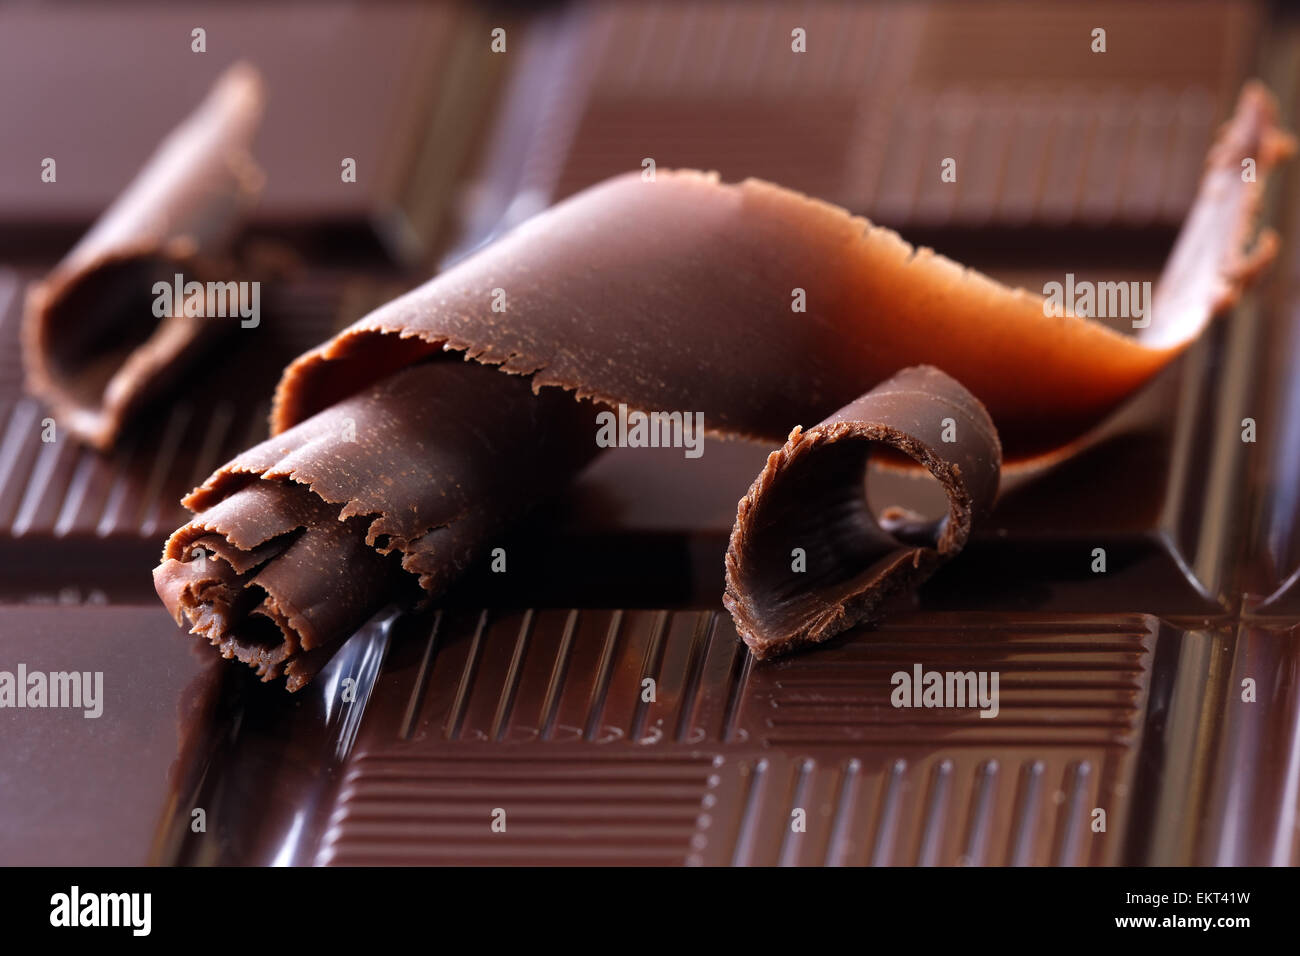 Dunkler Schokolade Späne Stockfoto